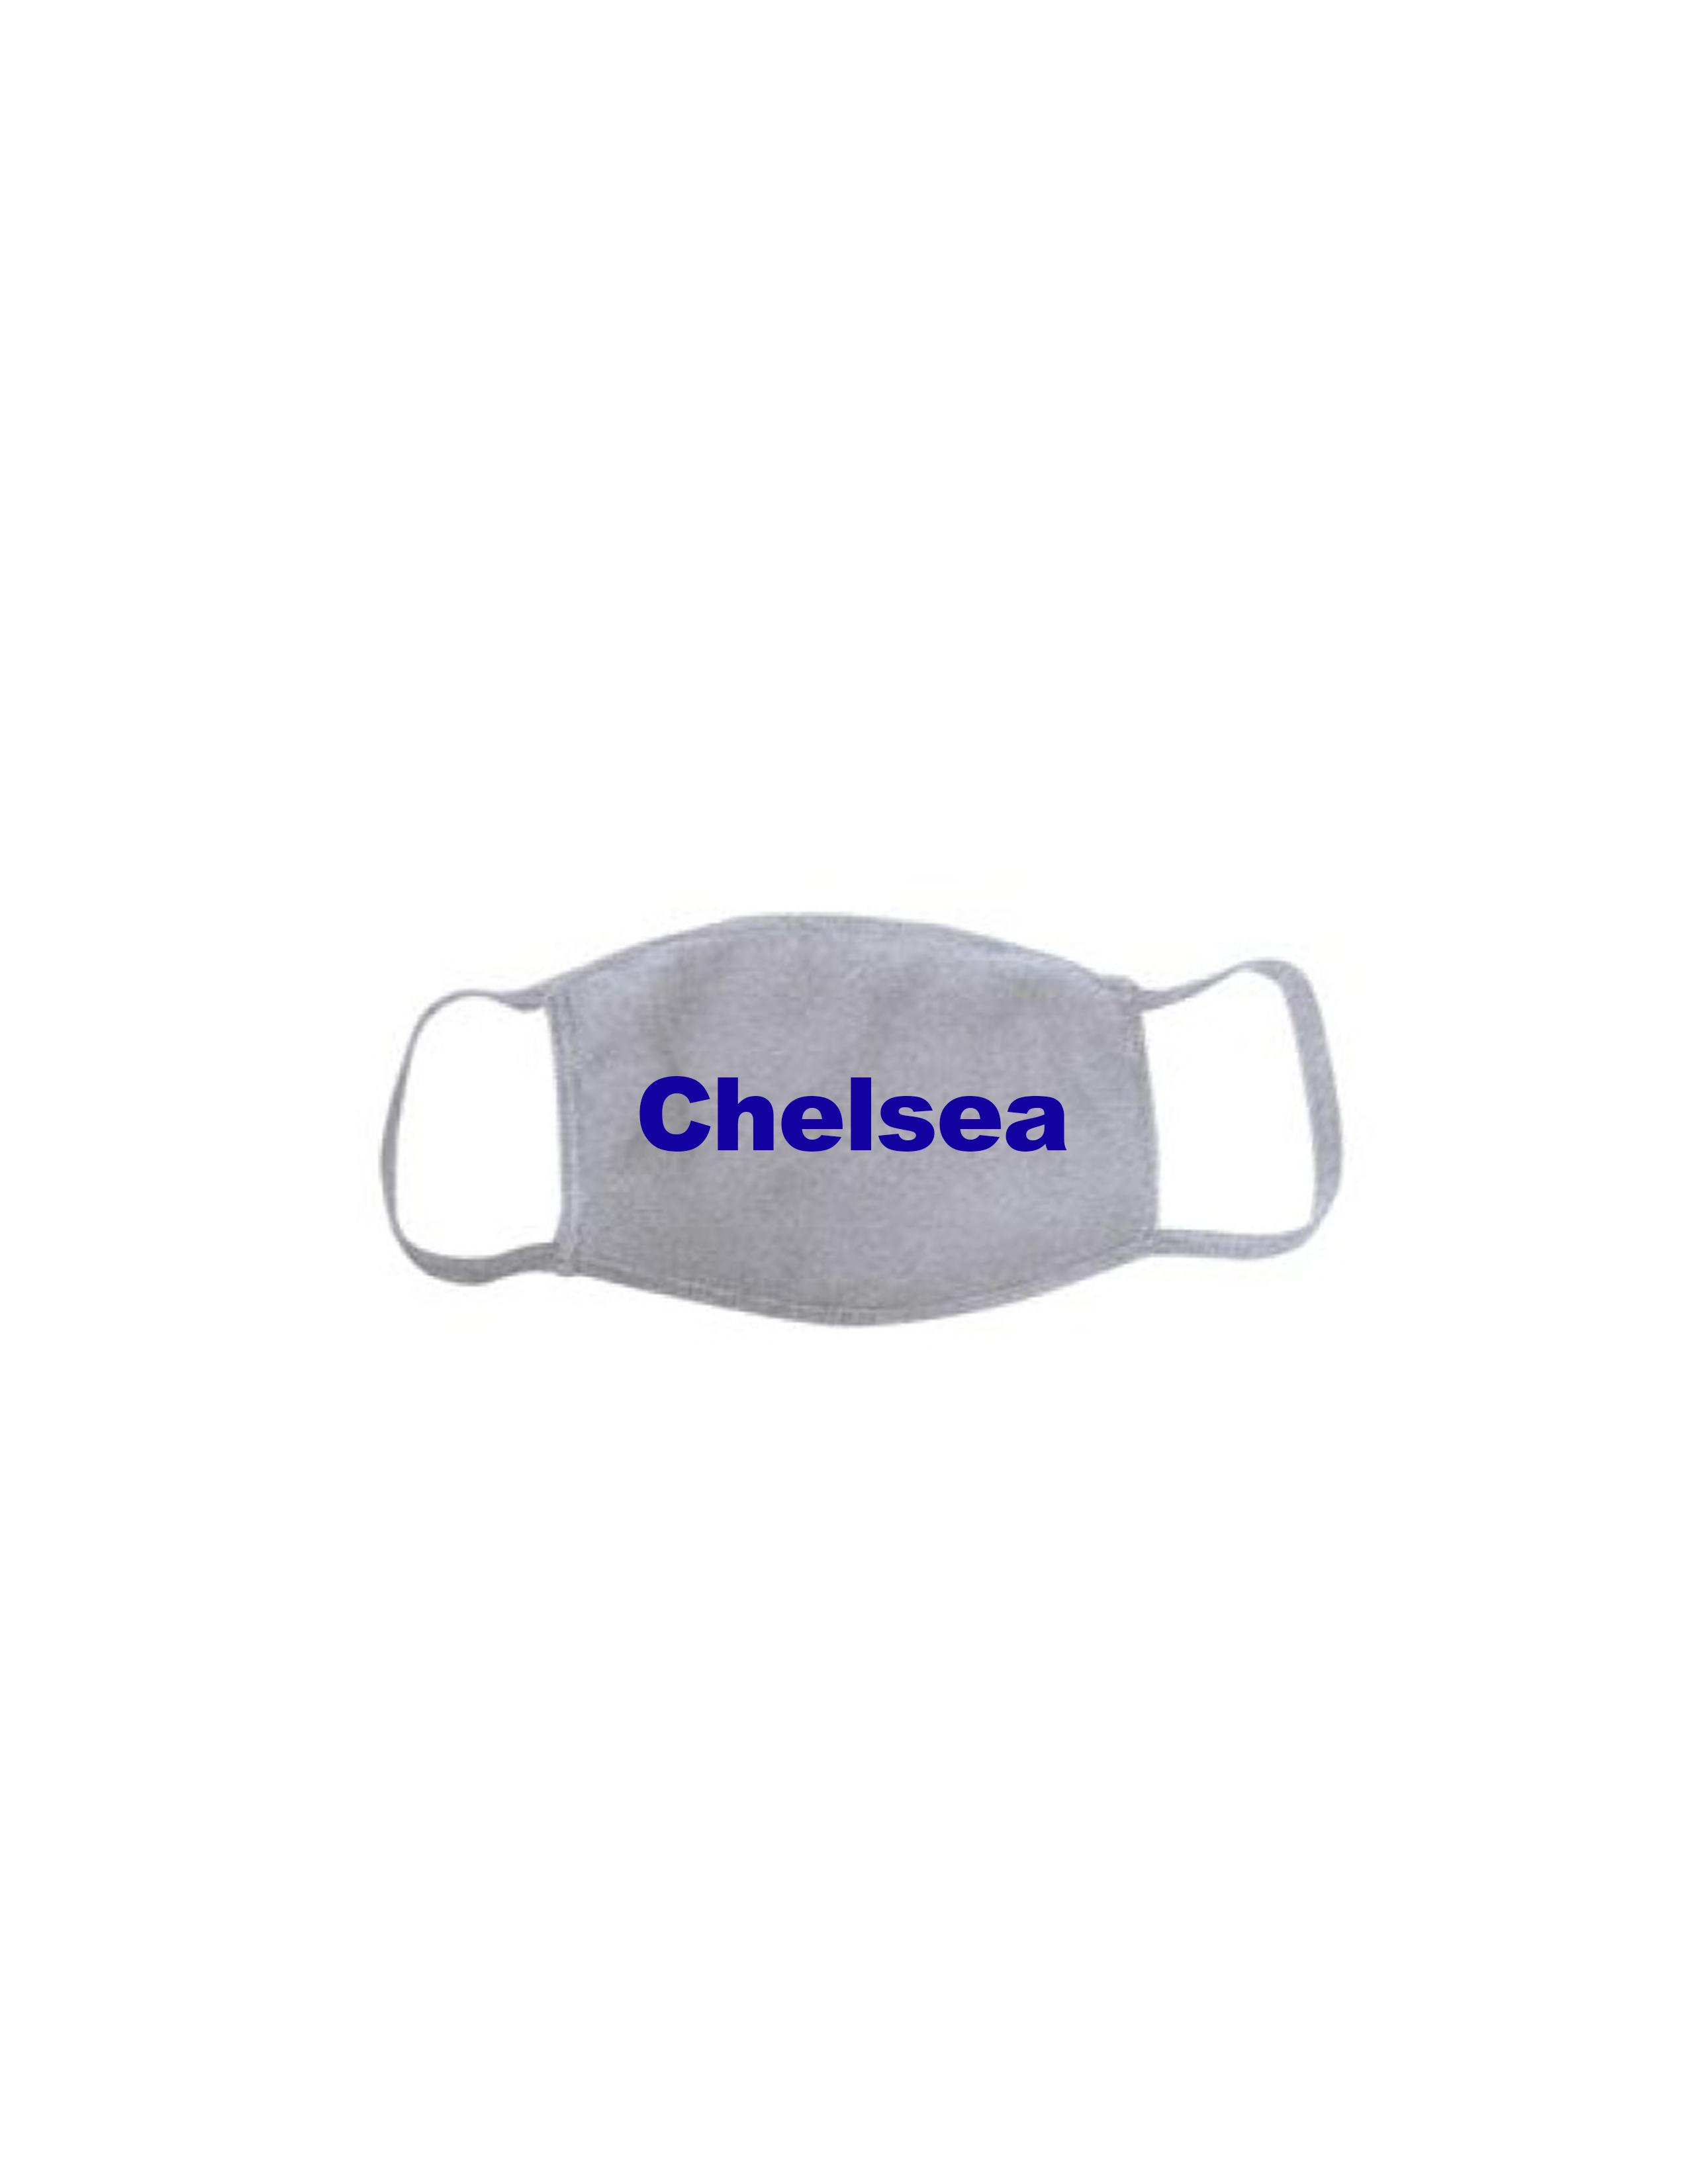 Football Mask's - Chelsea